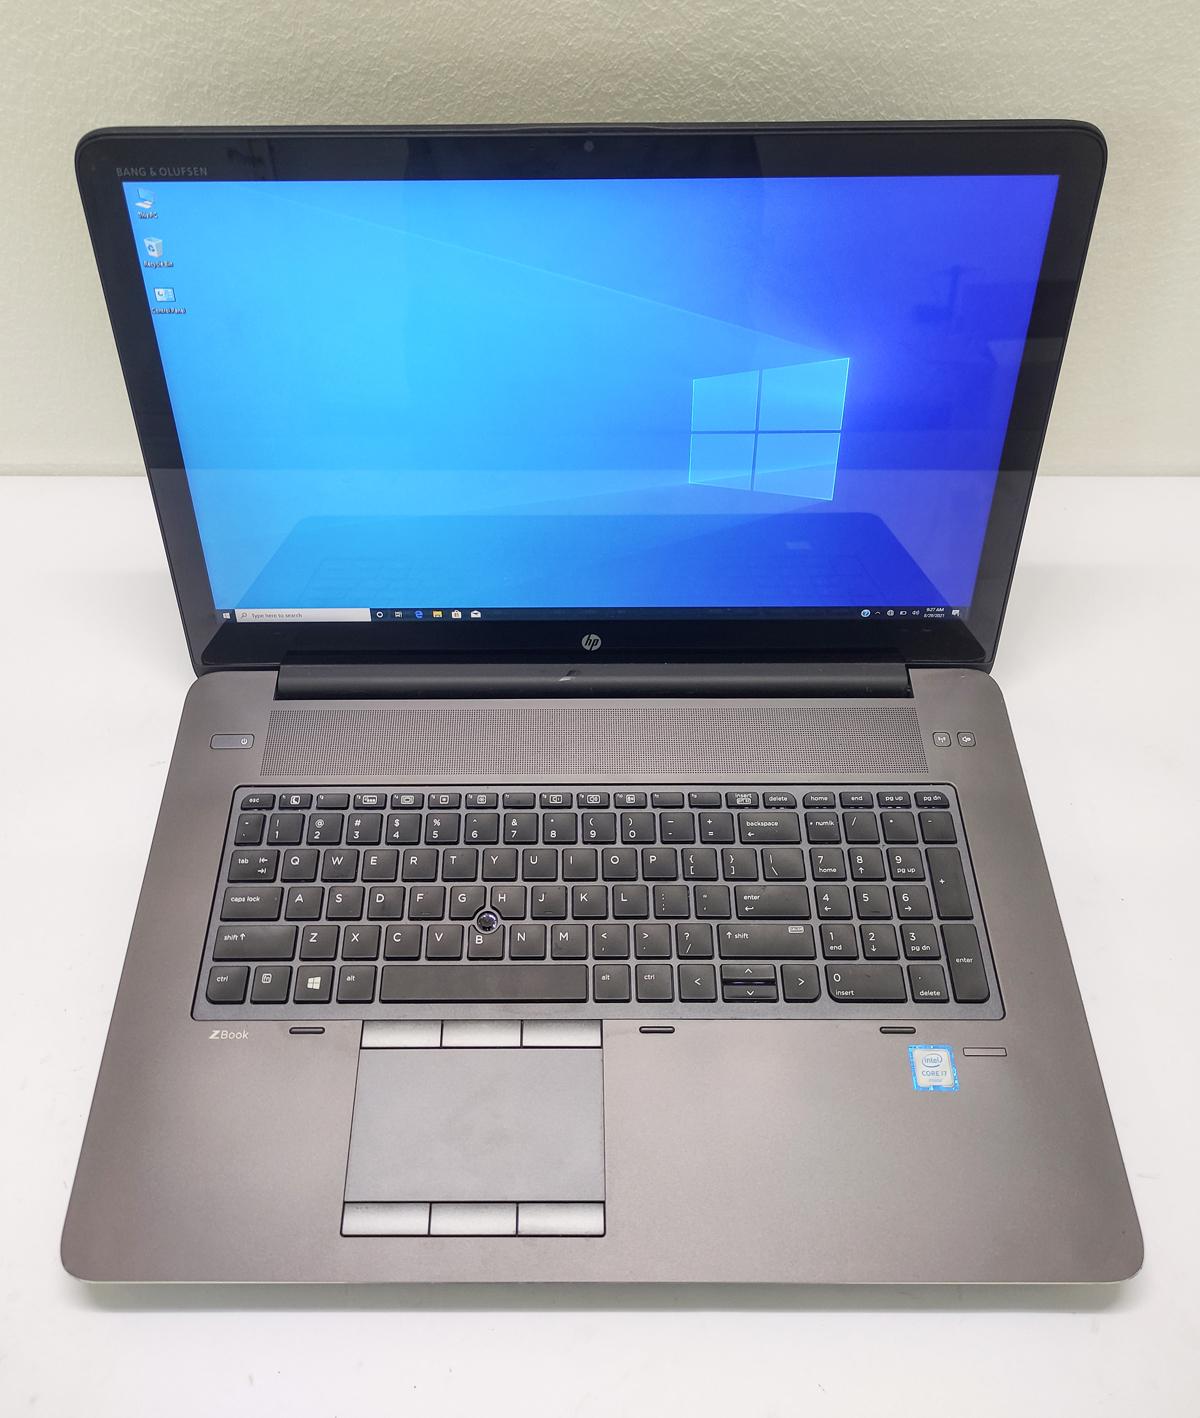 HP ZBook 17 G3 أقوى لاب توب وورك ستيشن للألعاب و الجرافيك